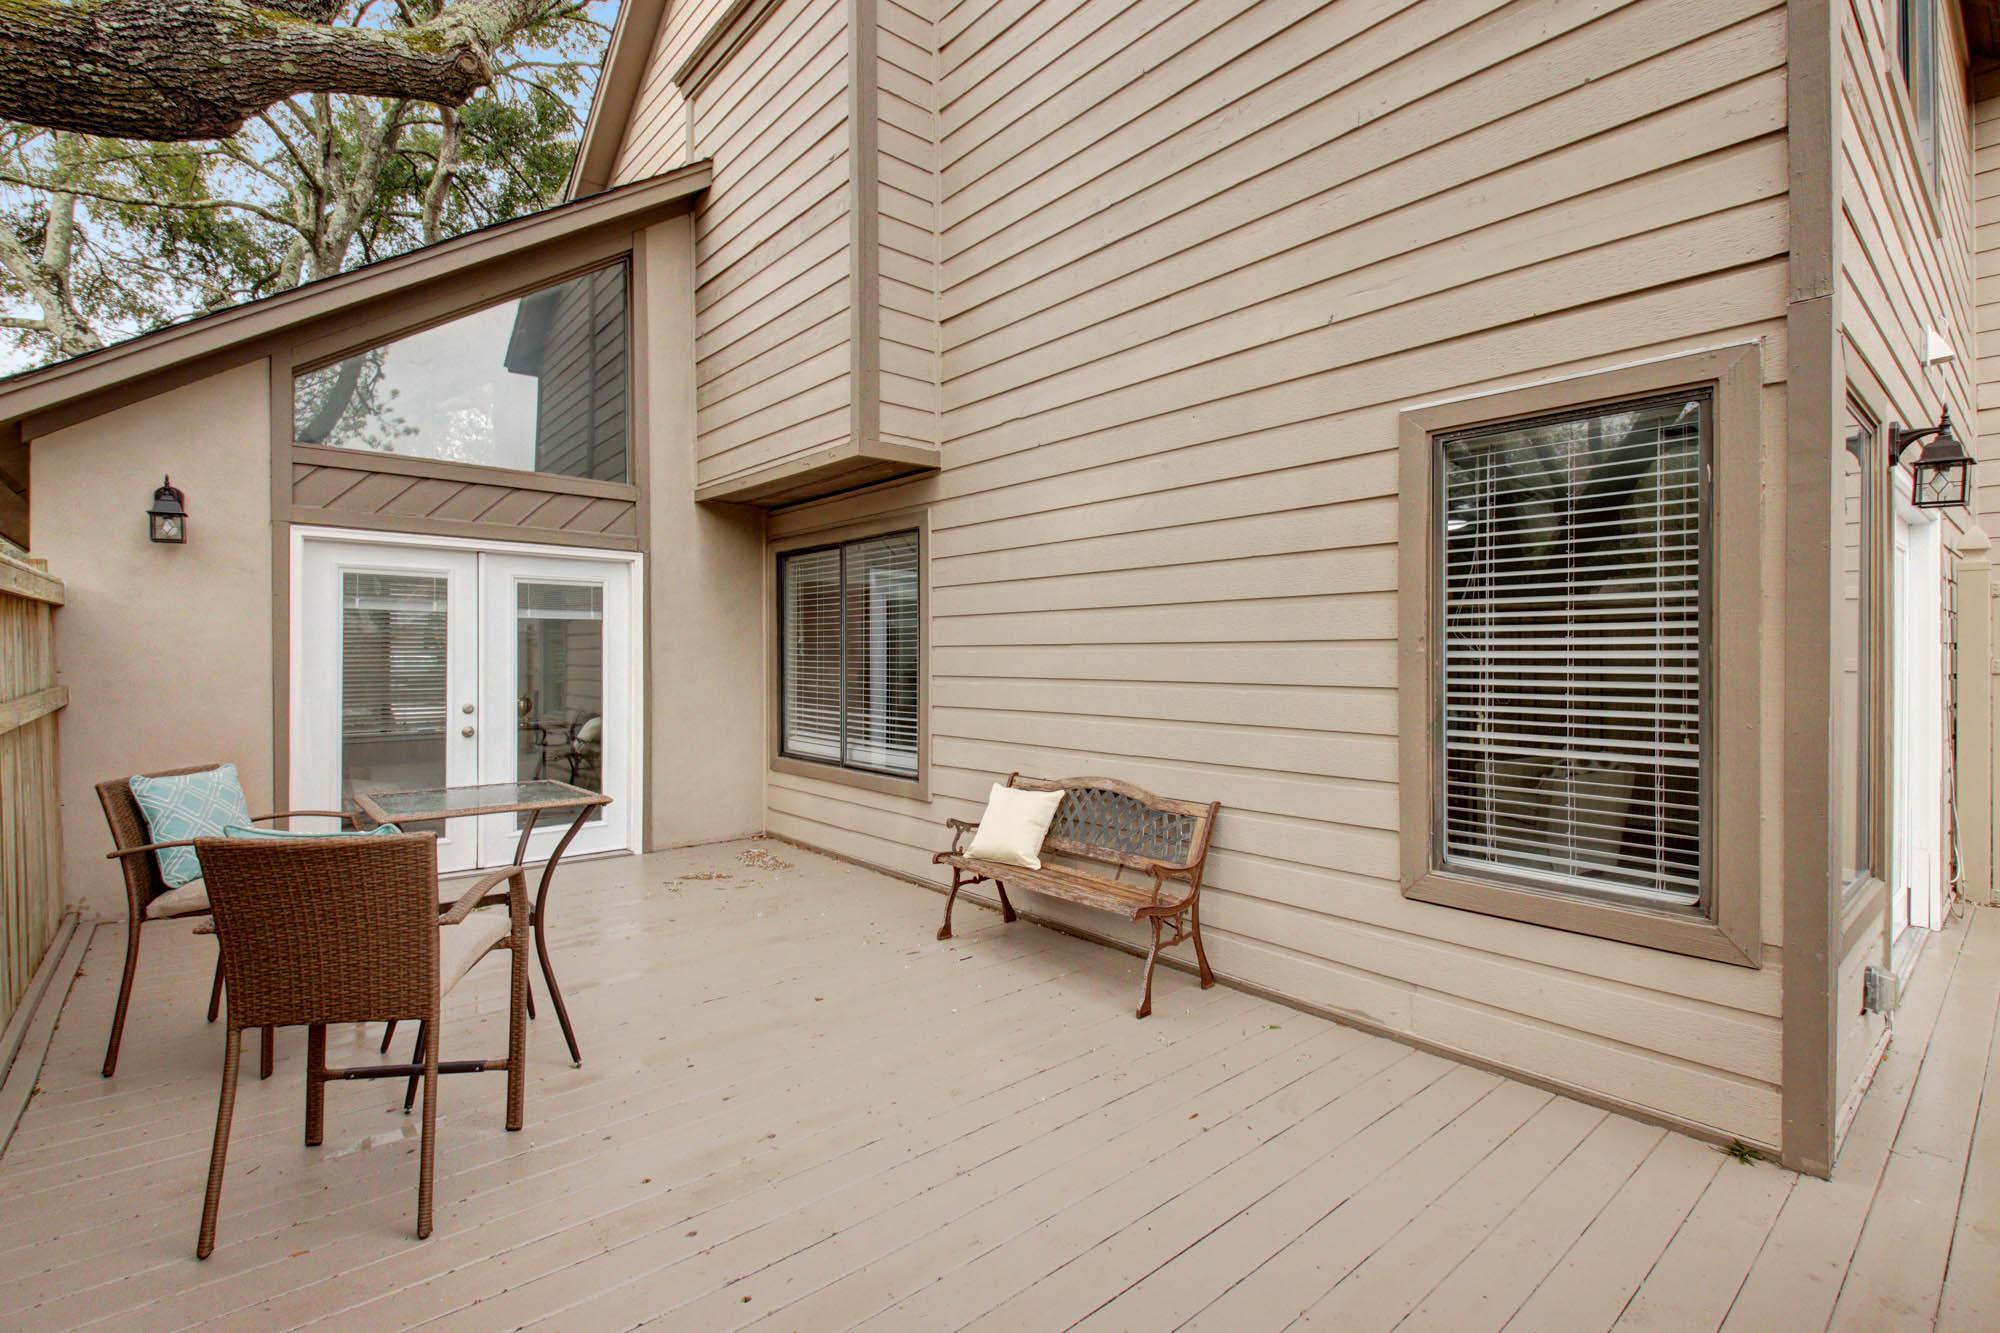 Sandpiper Pointe Homes For Sale - 335 Spoonbill, Mount Pleasant, SC - 2